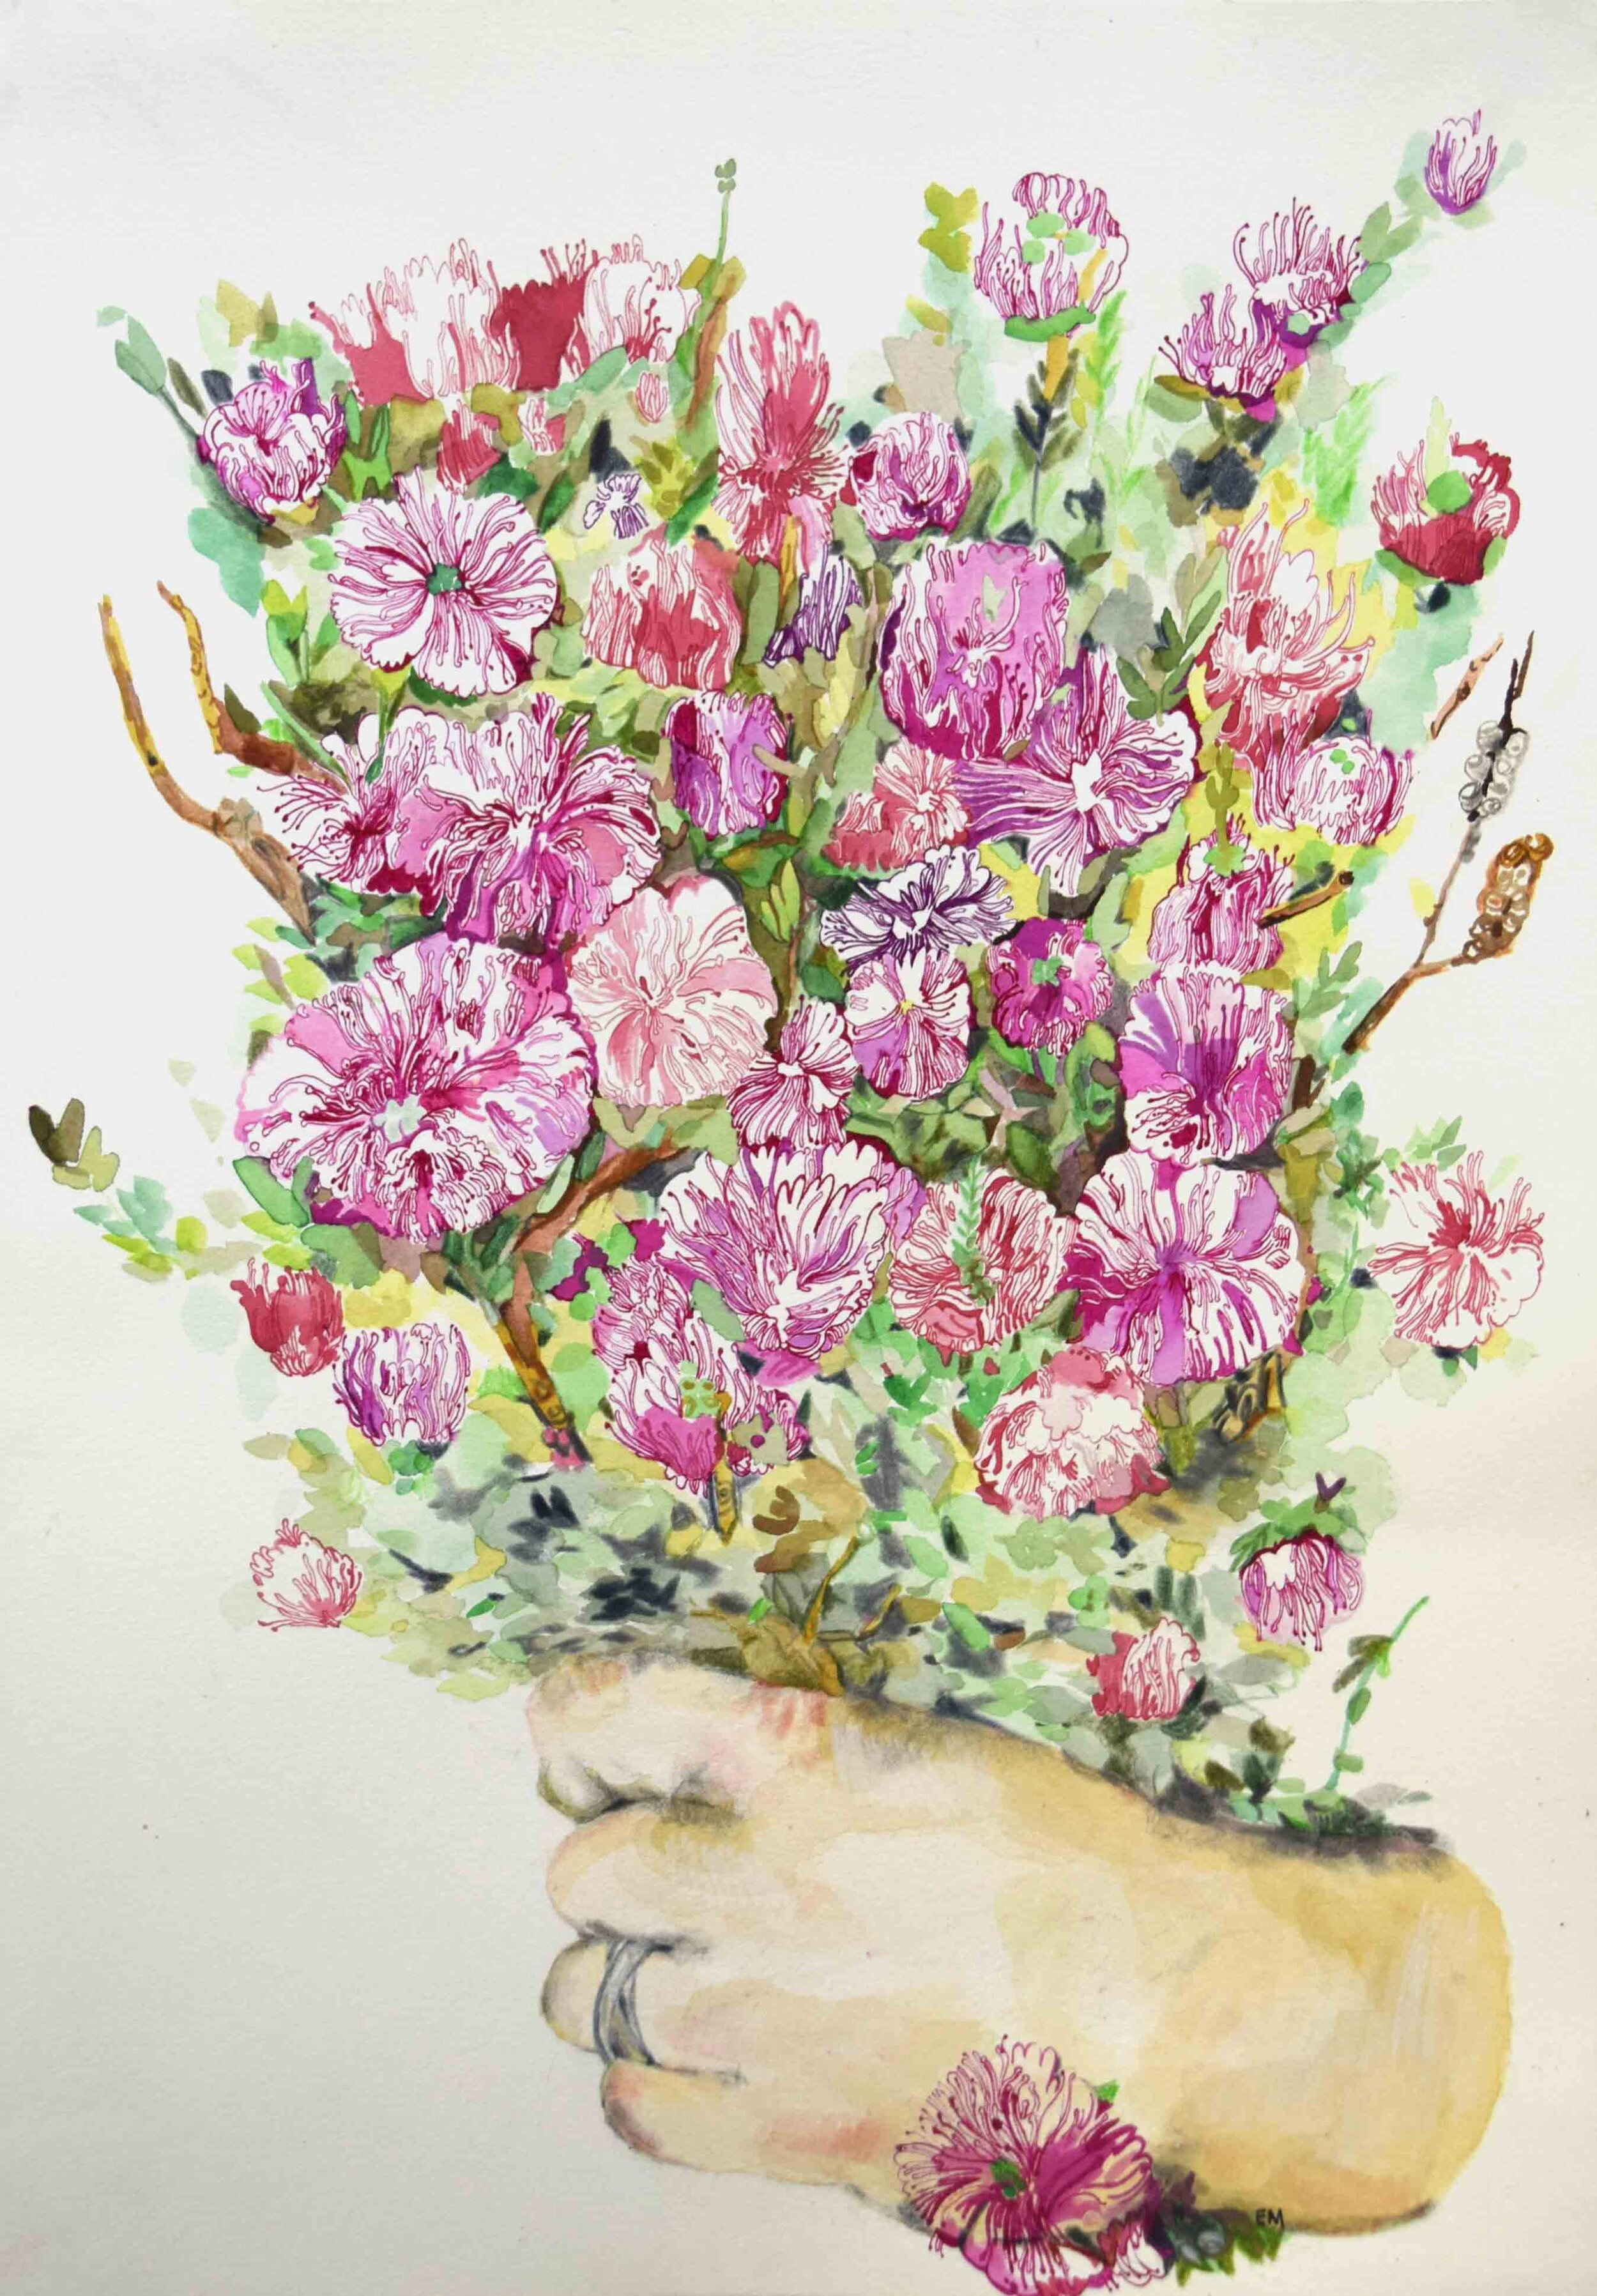 17. Elizabeth Marpole, Steal Life Bouquet of Melaleuca, 2019, pencil, water colour, ink on paper, 42 x 29.7 cm $270 2